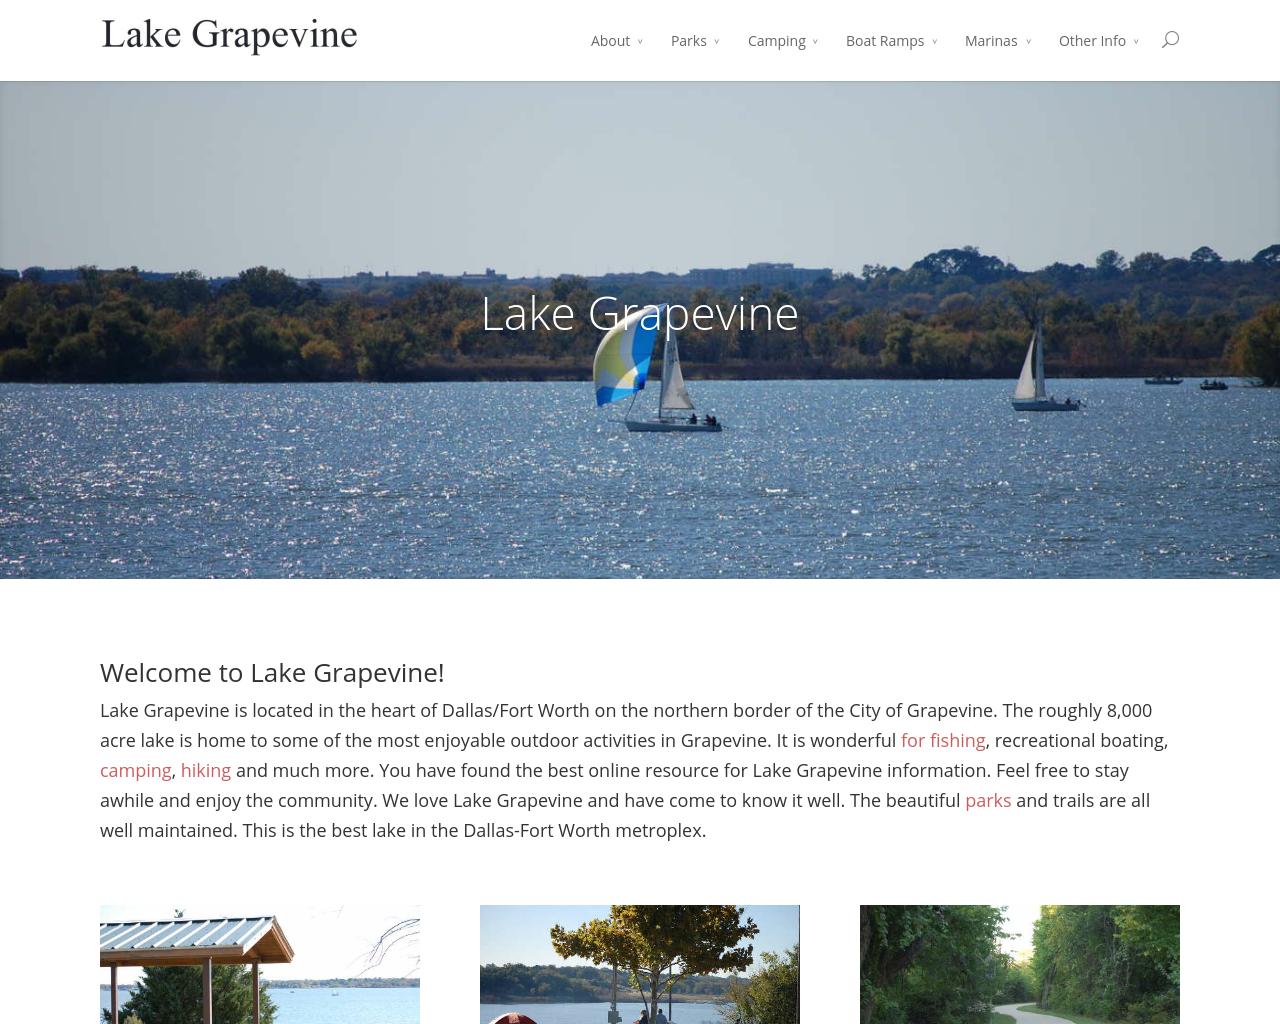 Lake-Grapevine-Advertising-Reviews-Pricing